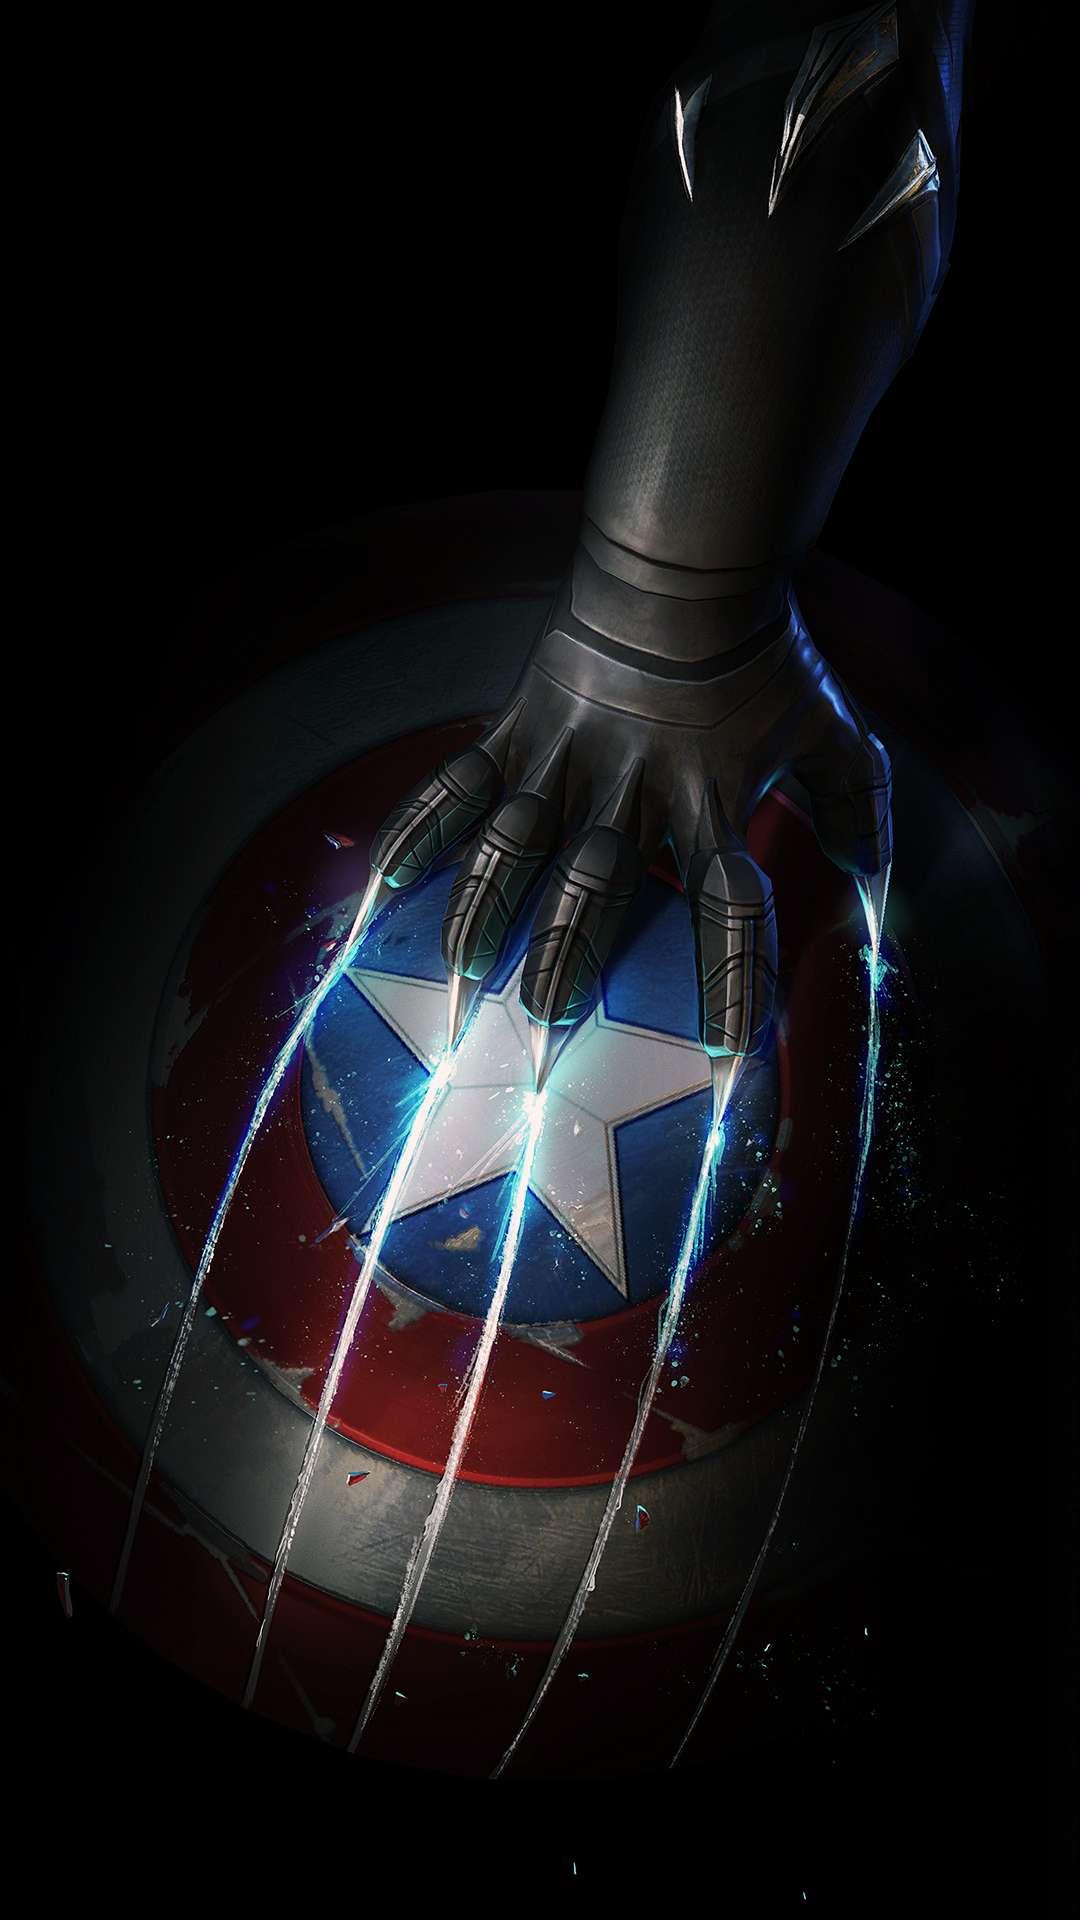 Captain America Amoled iPhone Wallpaper